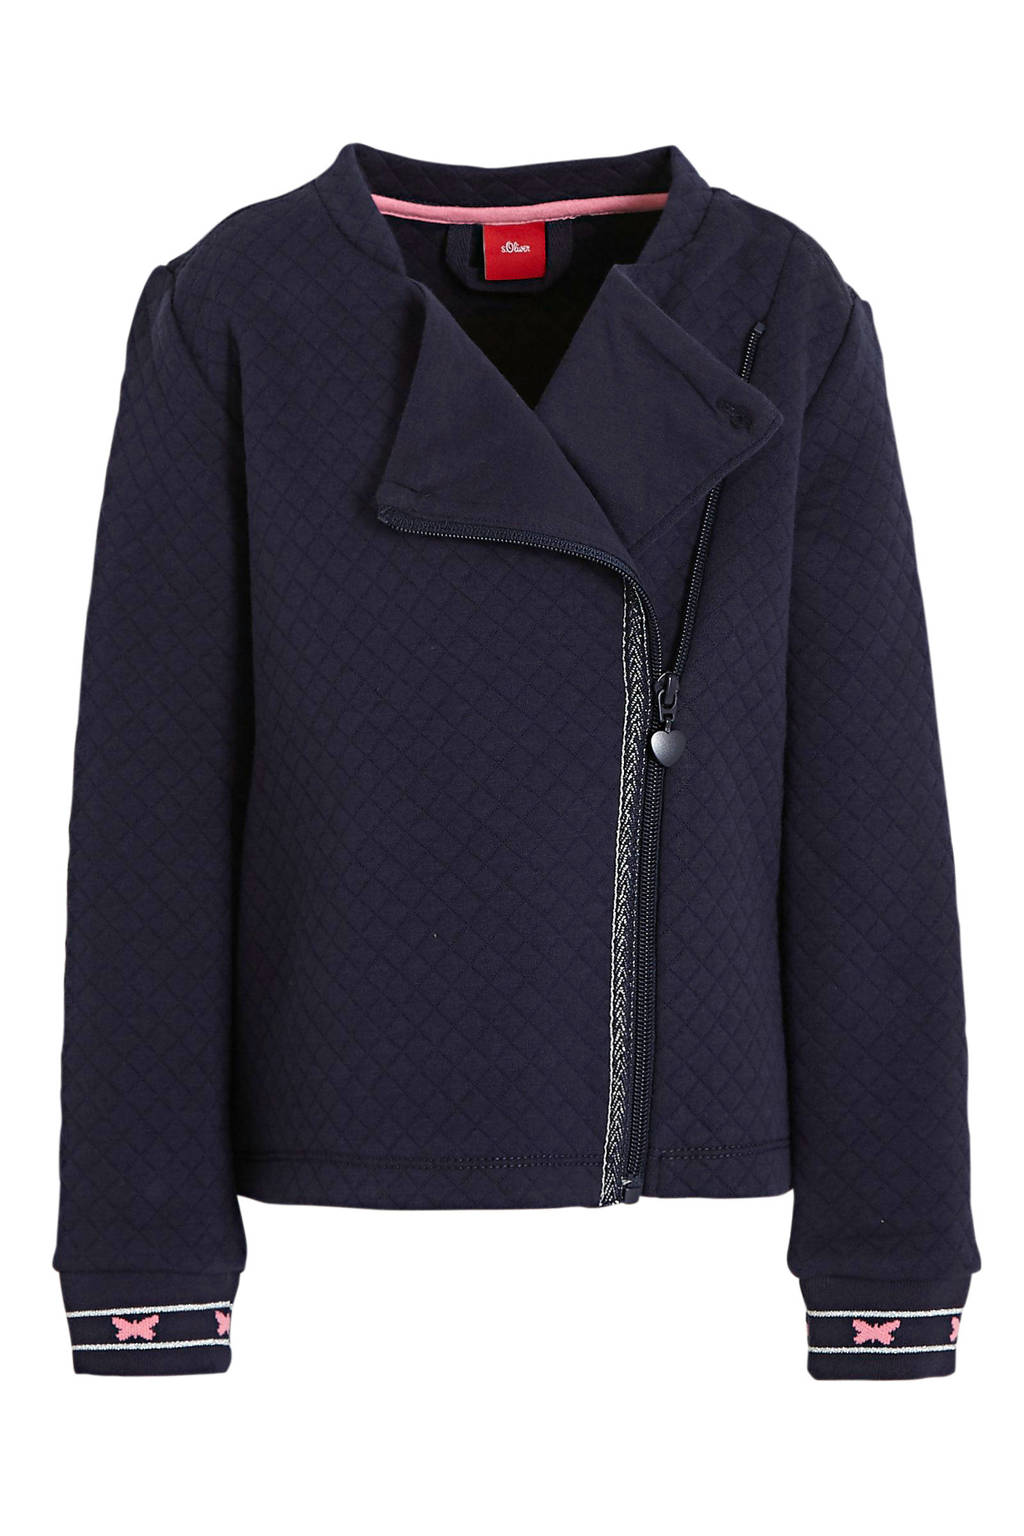 s.Oliver jasje met glitters donkerblauw, Donkerblauw